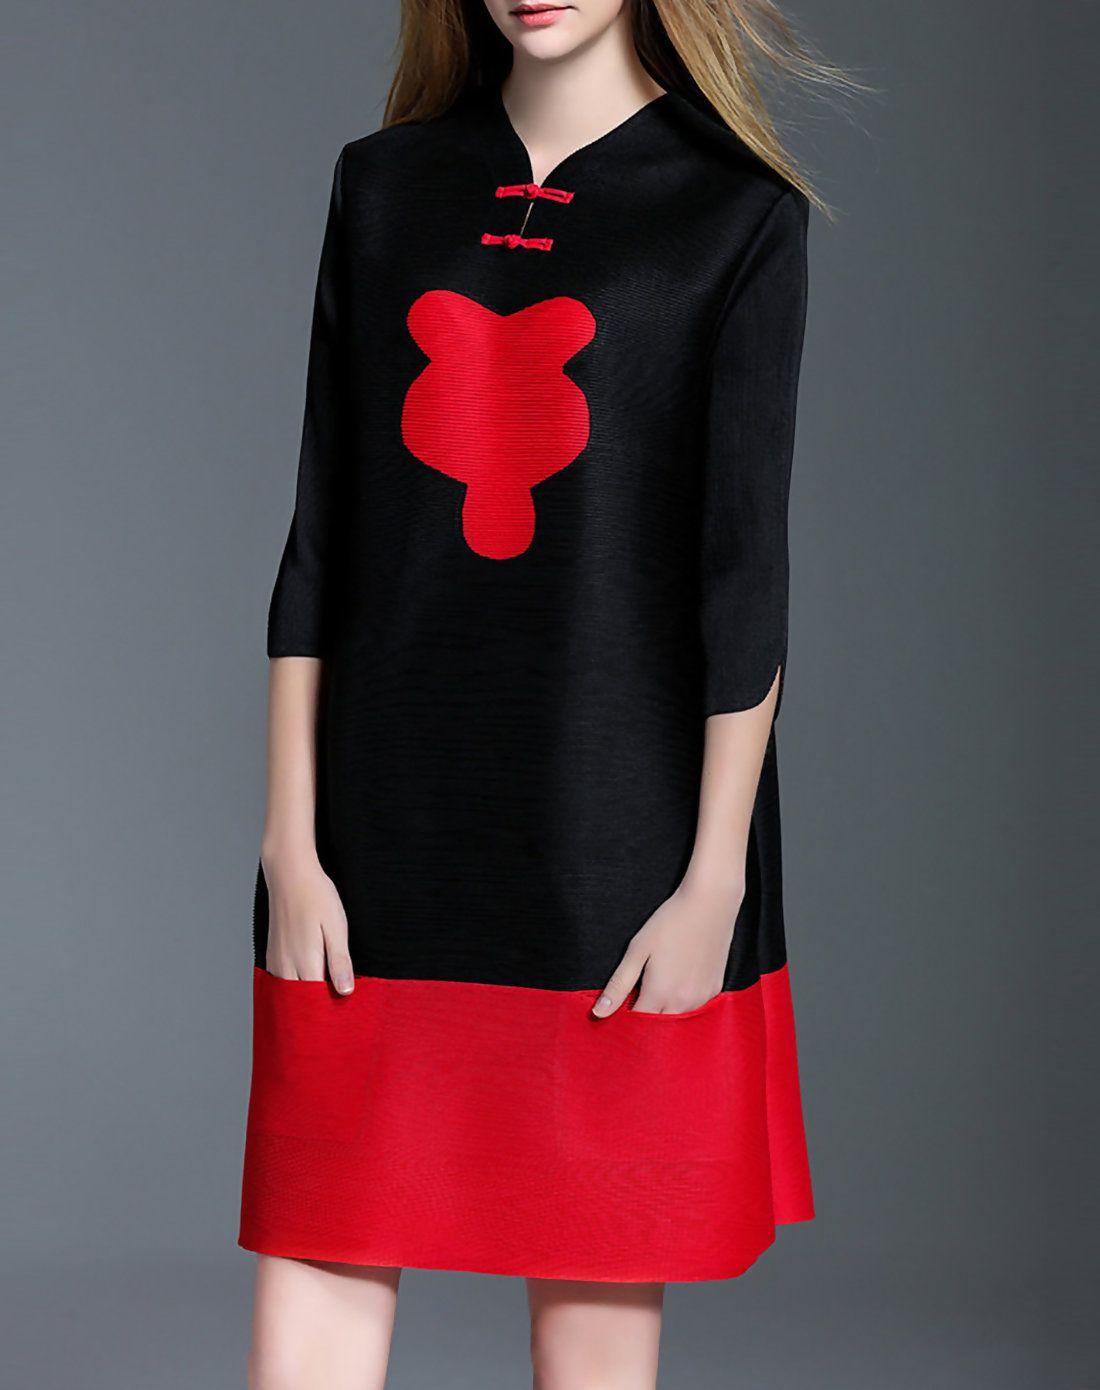 Adorewe daipya lovely casual sleeve v neck mini dress adorewe